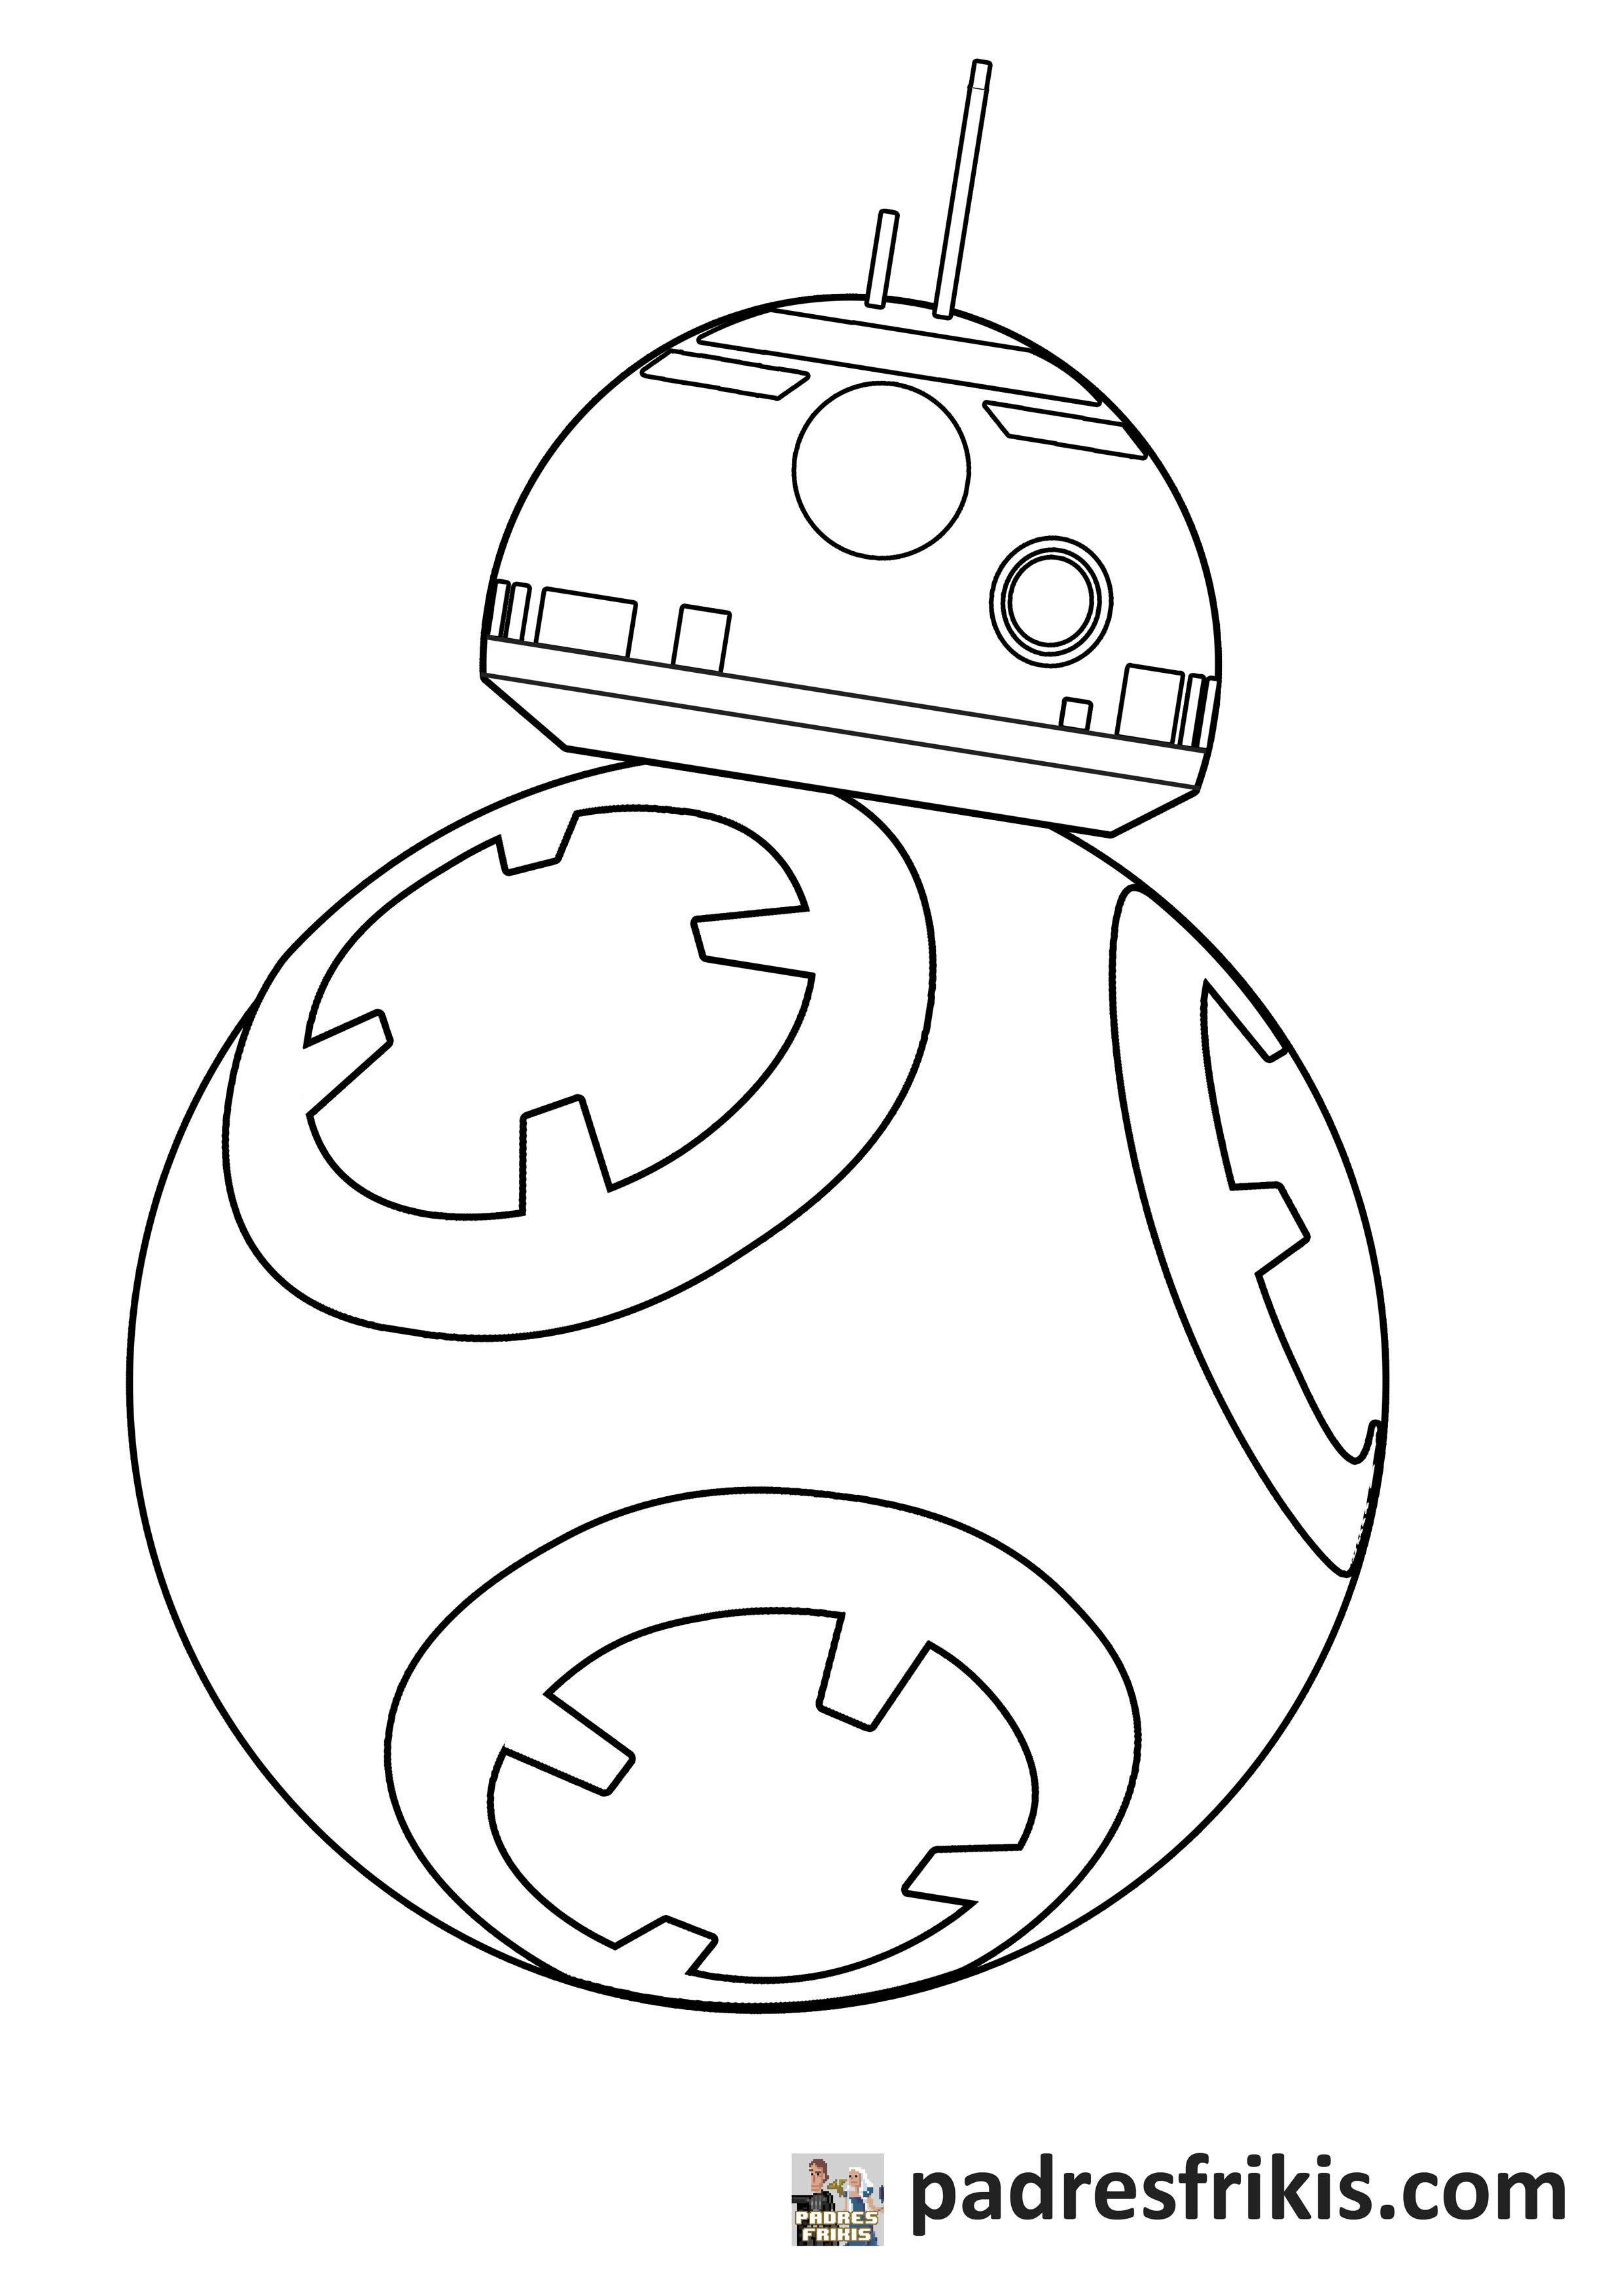 Dibujos Para Colorear E Imprimir De Lego Star Wars Auto Electrical